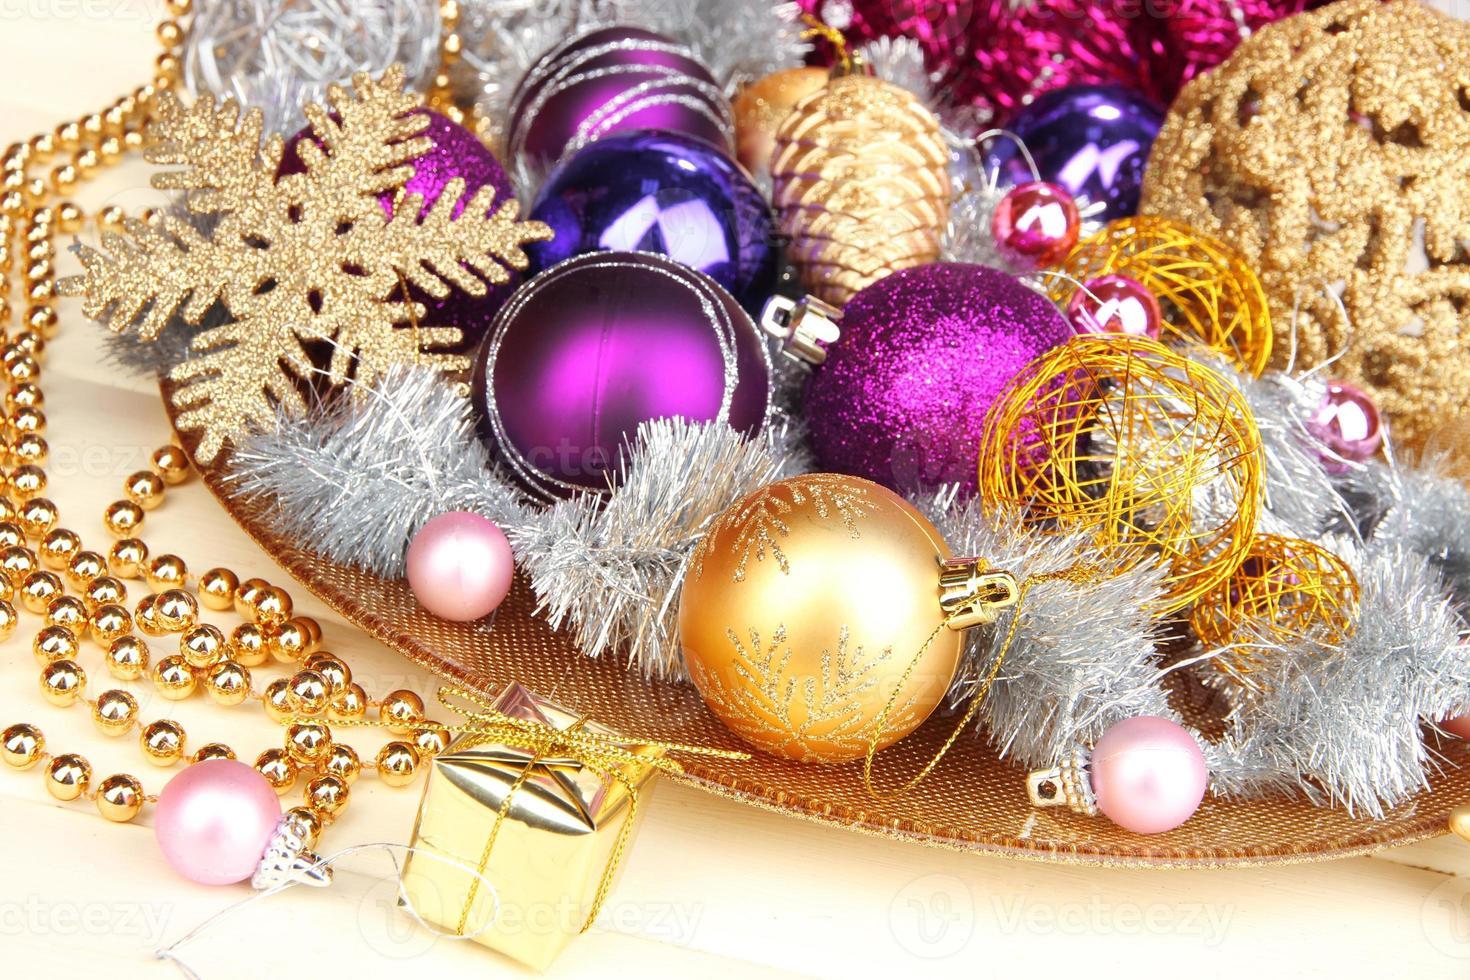 Christmas decorations close up photo